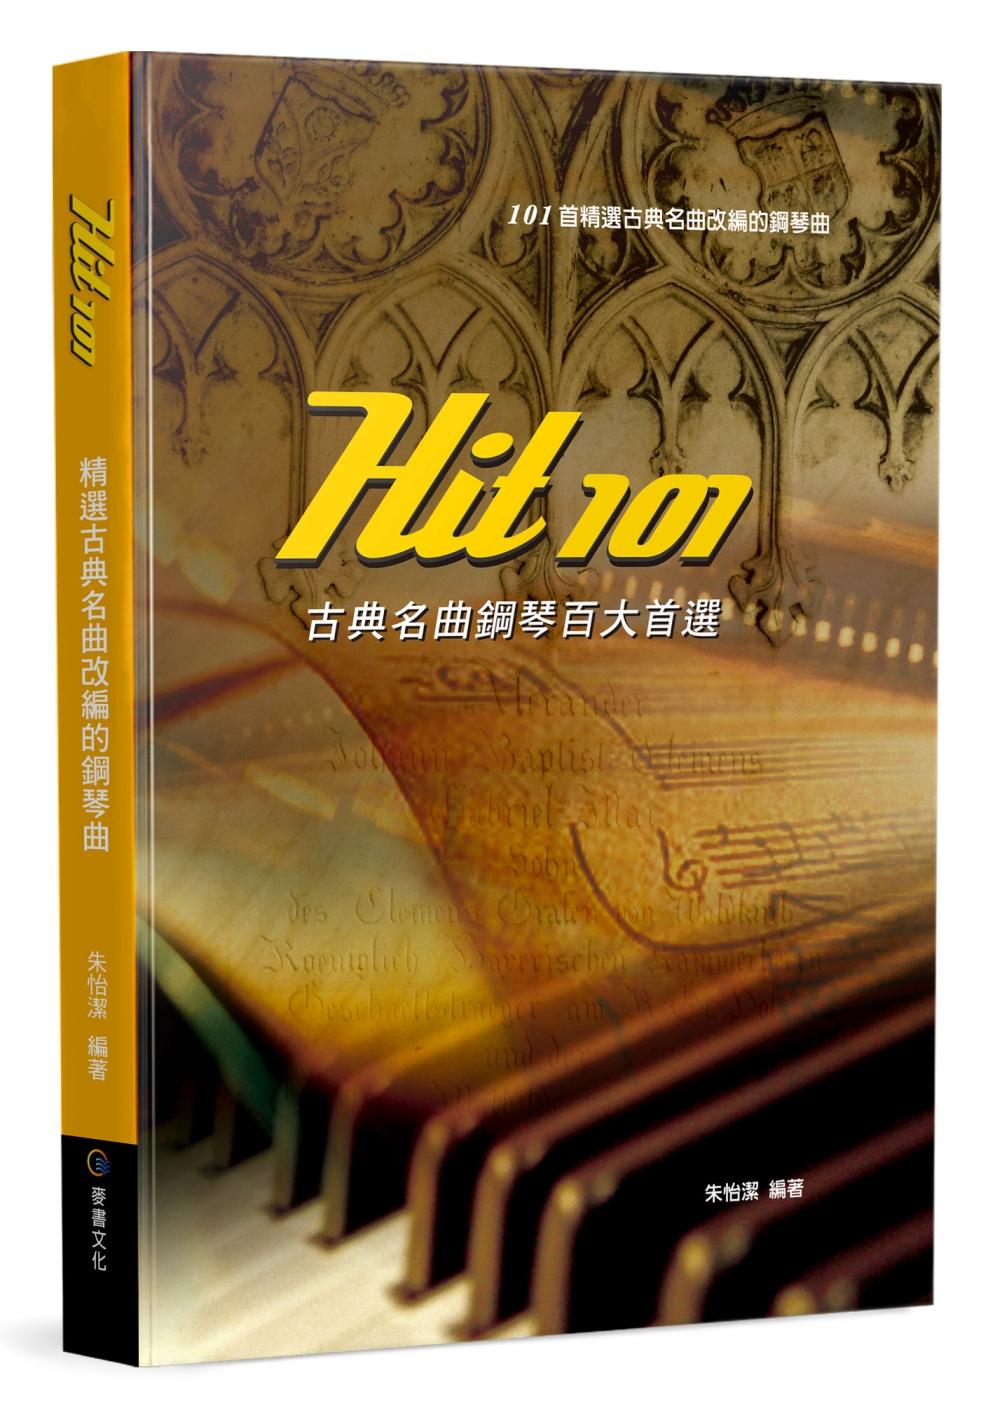 Hit101古典名曲鋼琴百大首選(四版)